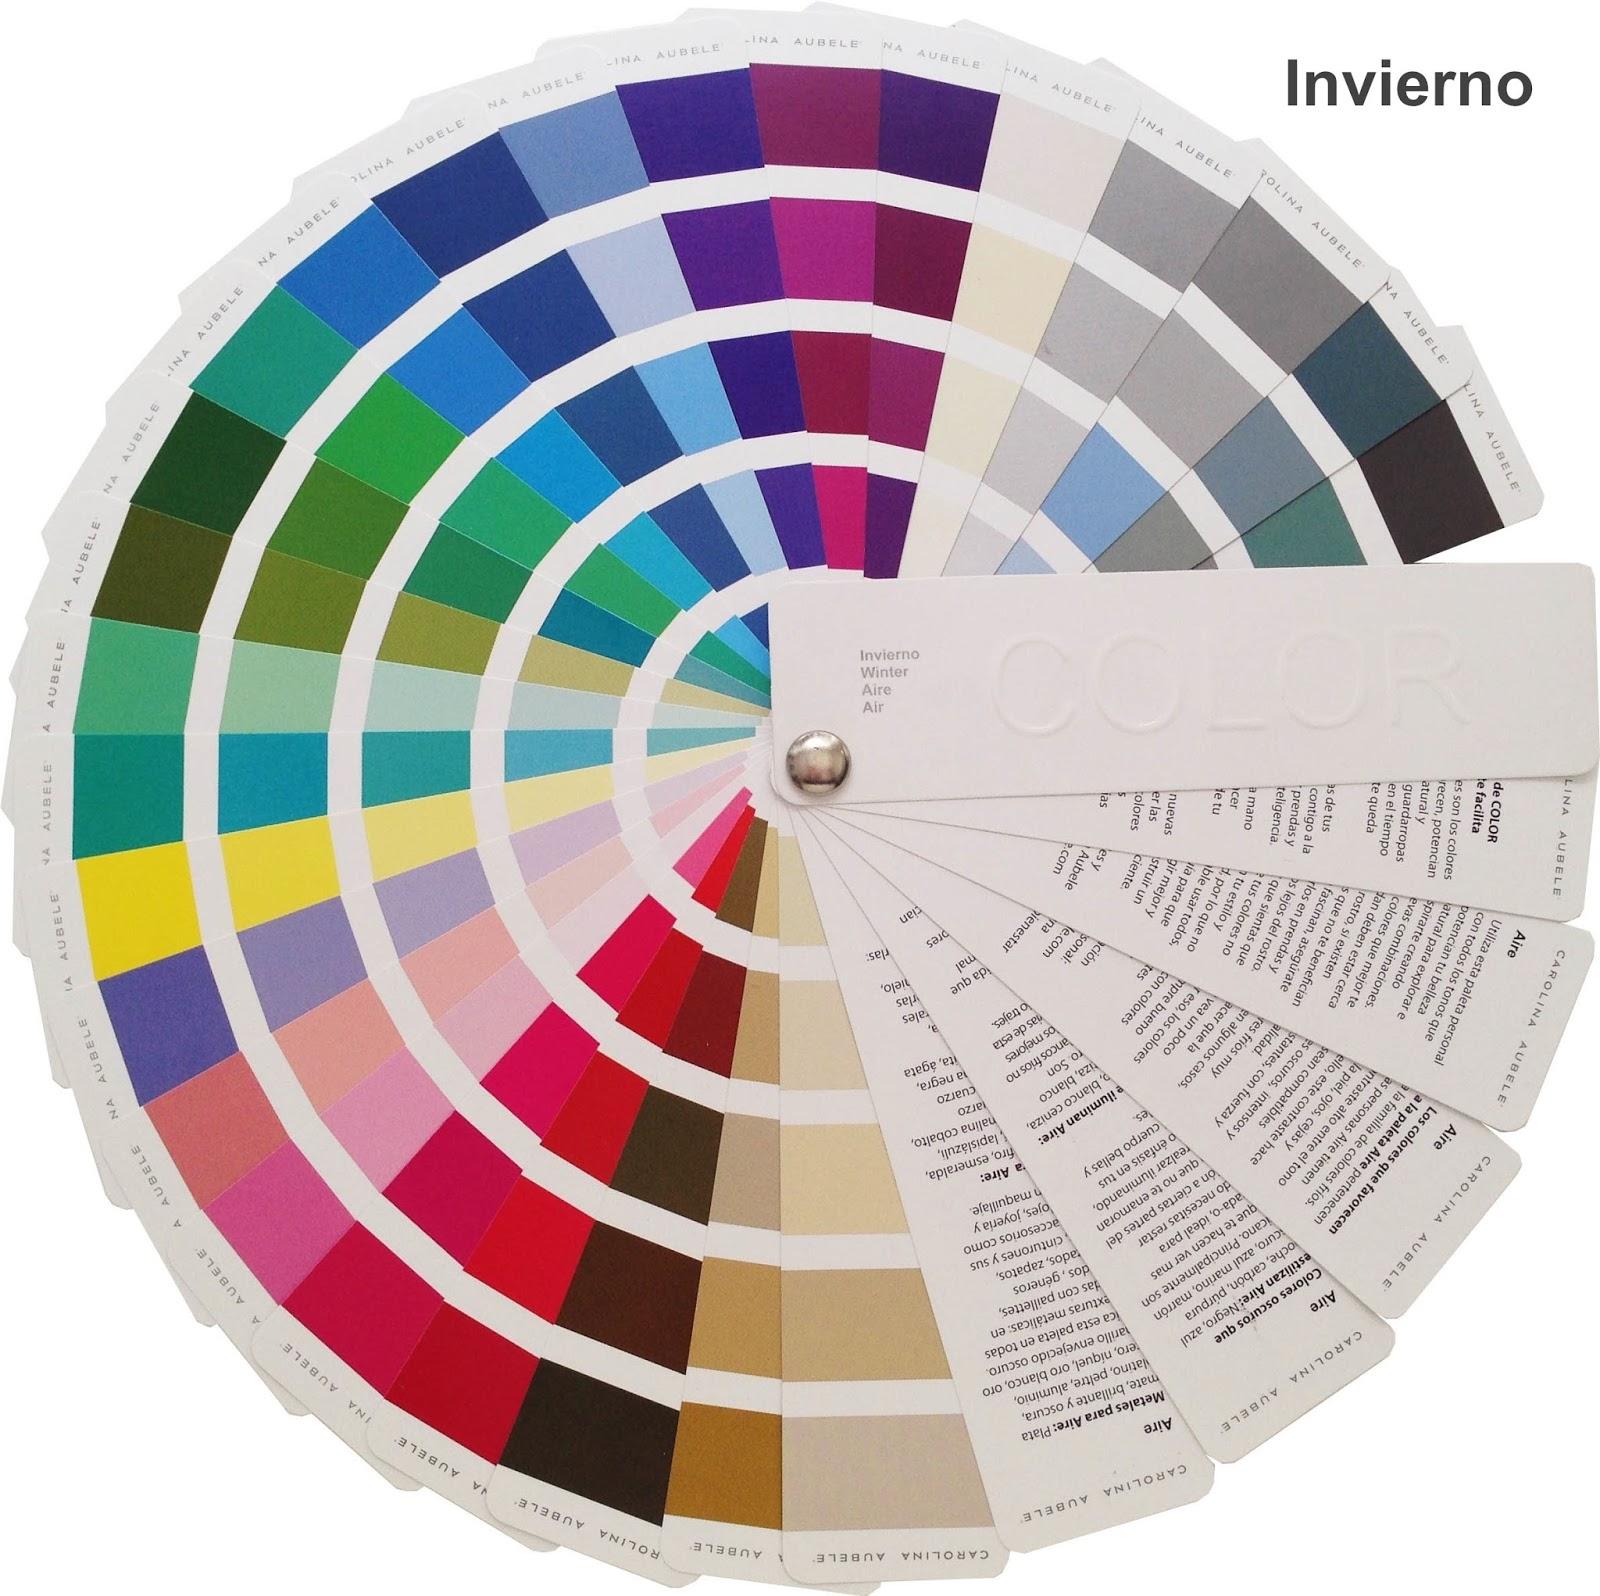 Como determinar tu colorimetr a - Paleta cromatica de colores ...